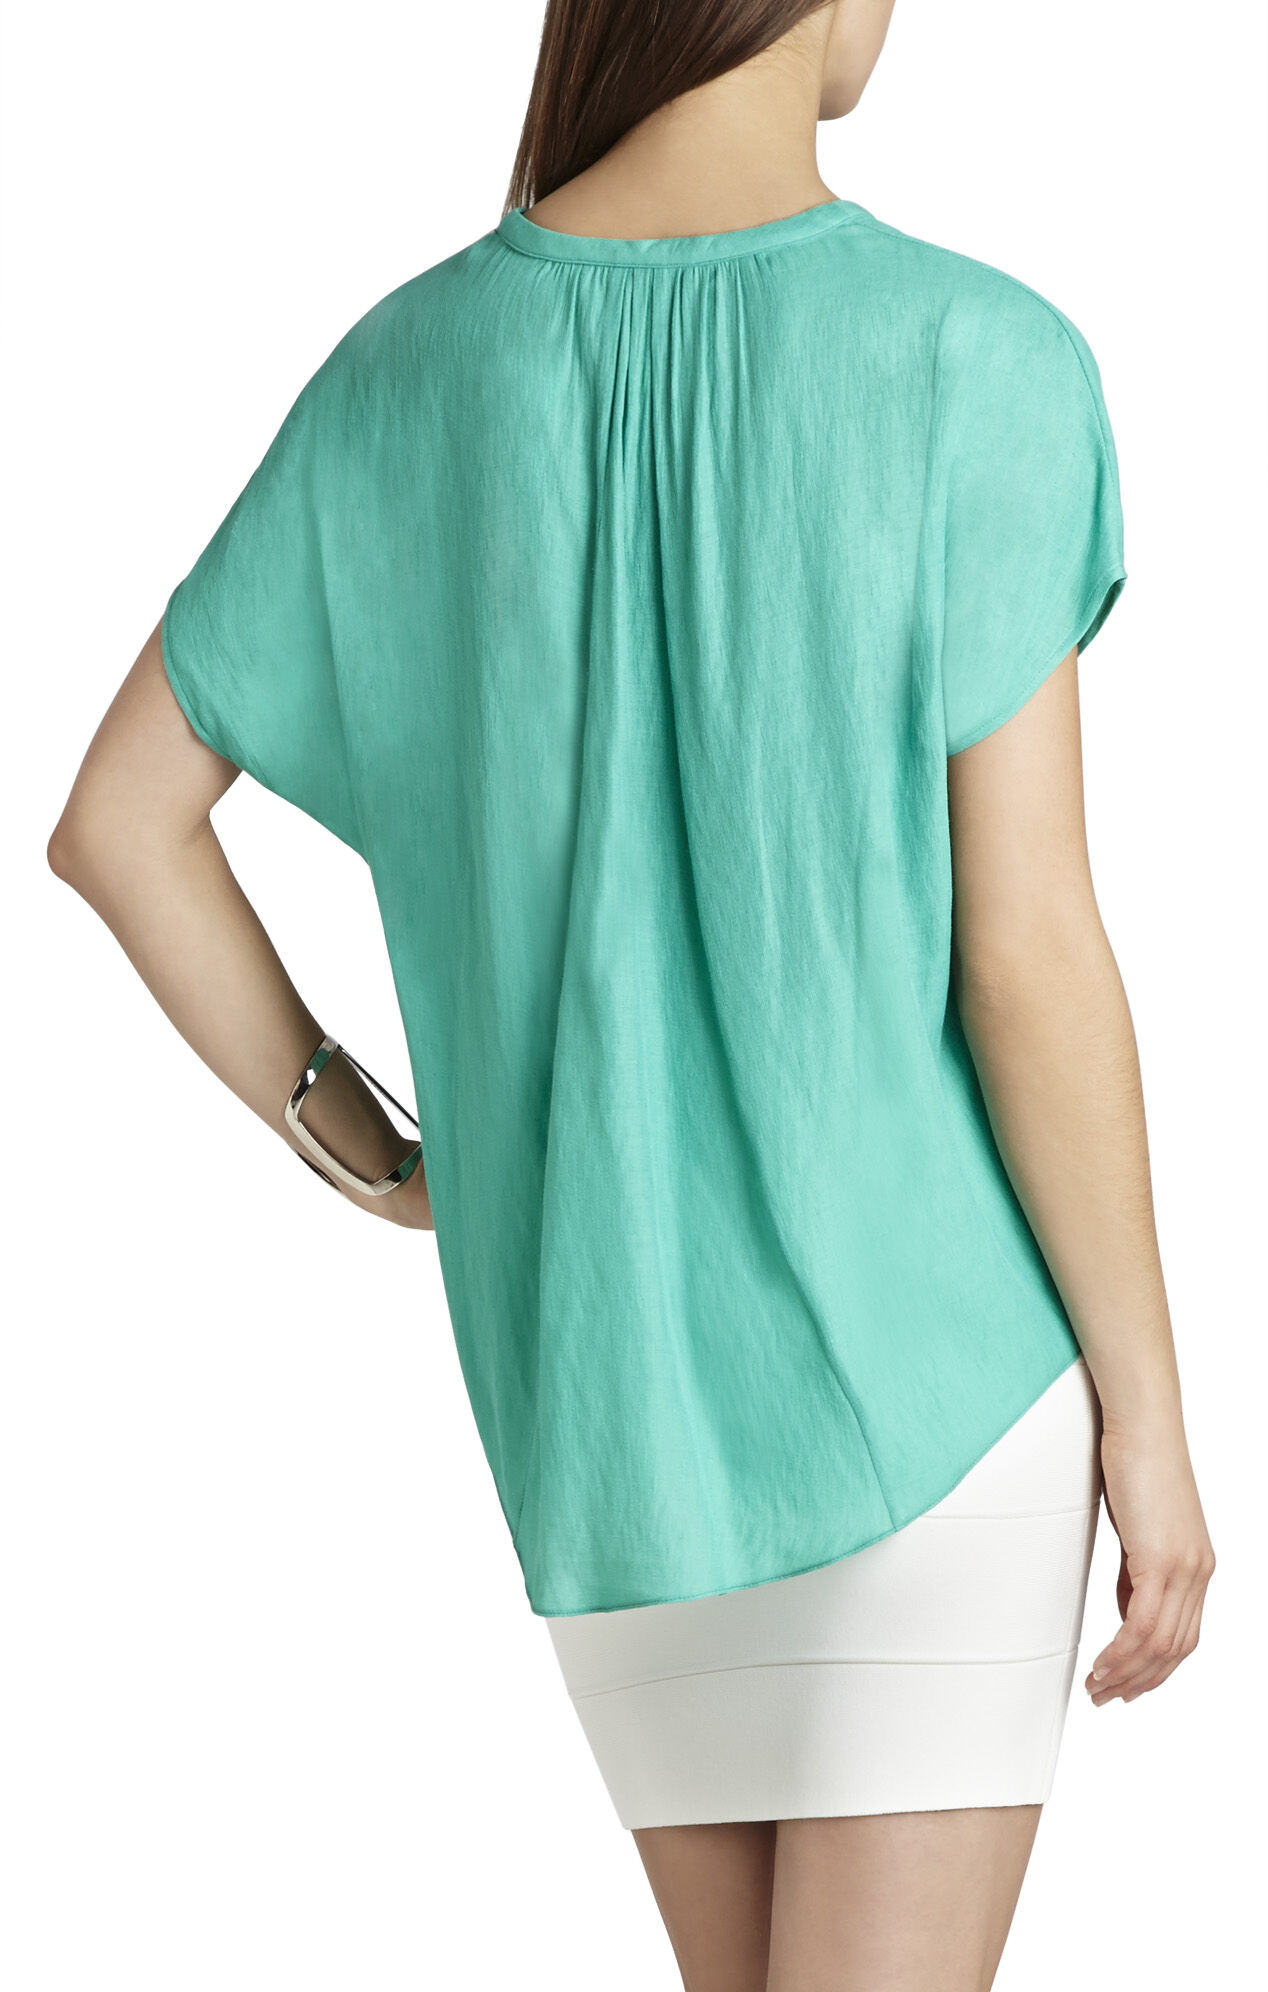 Ayanna Oversized ScarfShirt